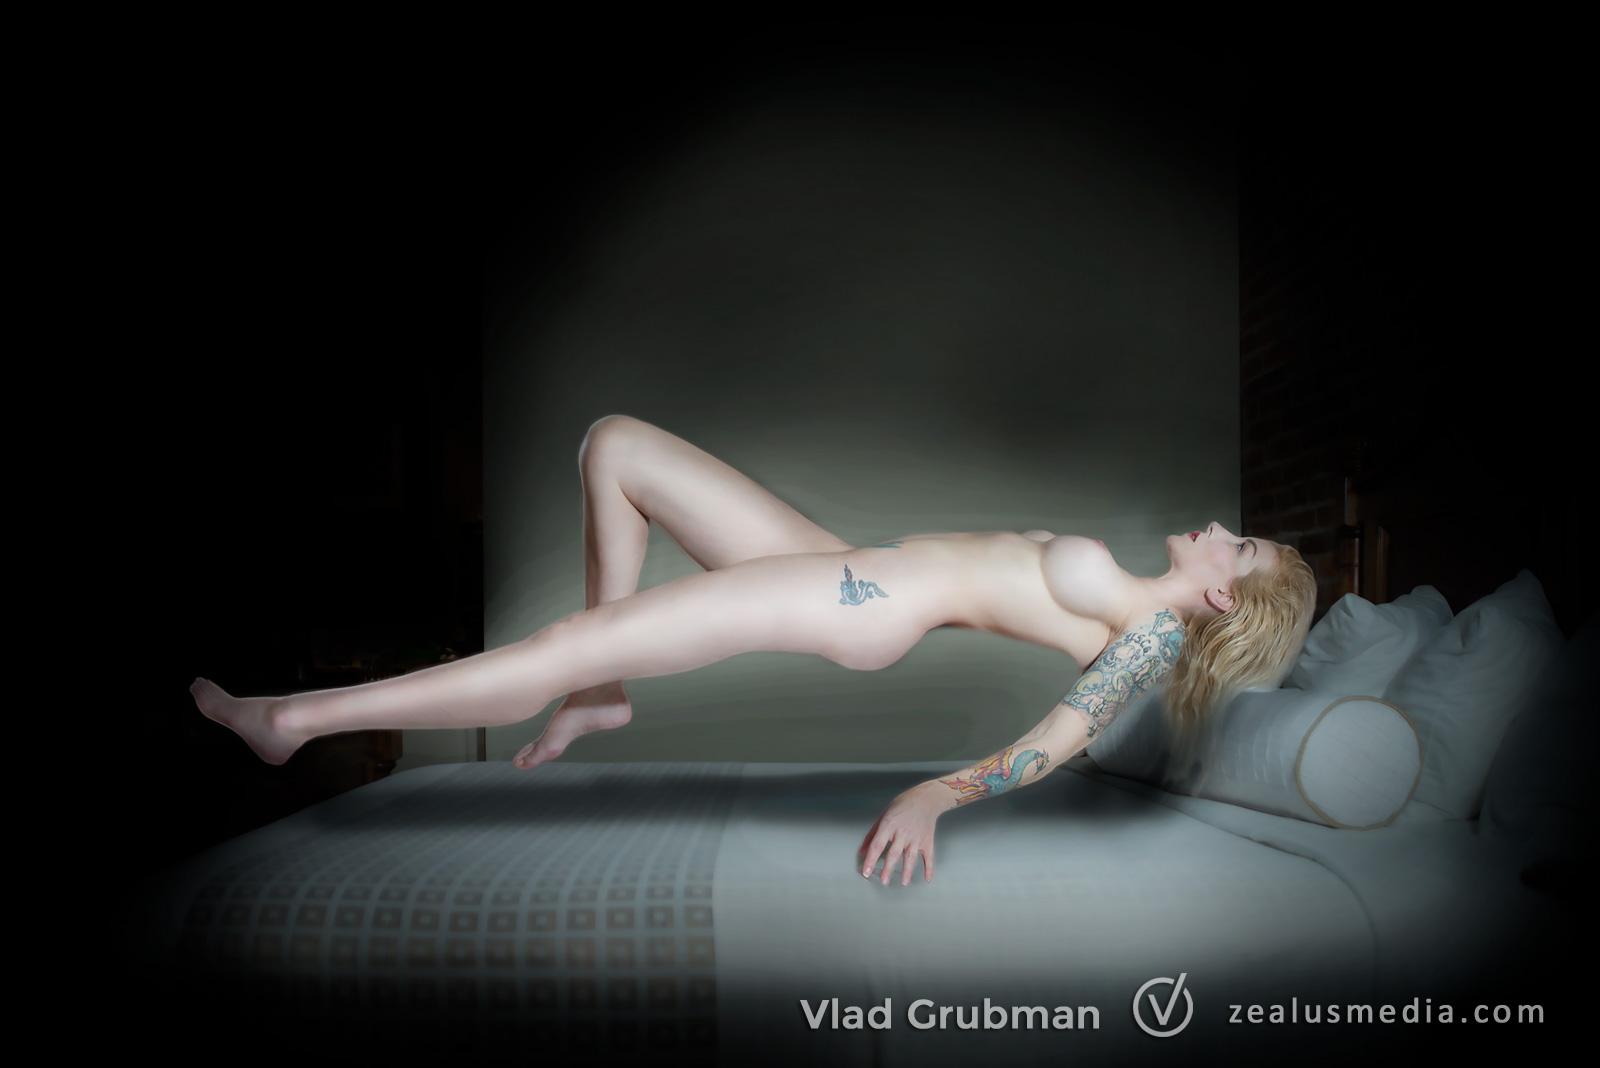 Boudoir photography by Vlad Grubman / WannaGlow.com